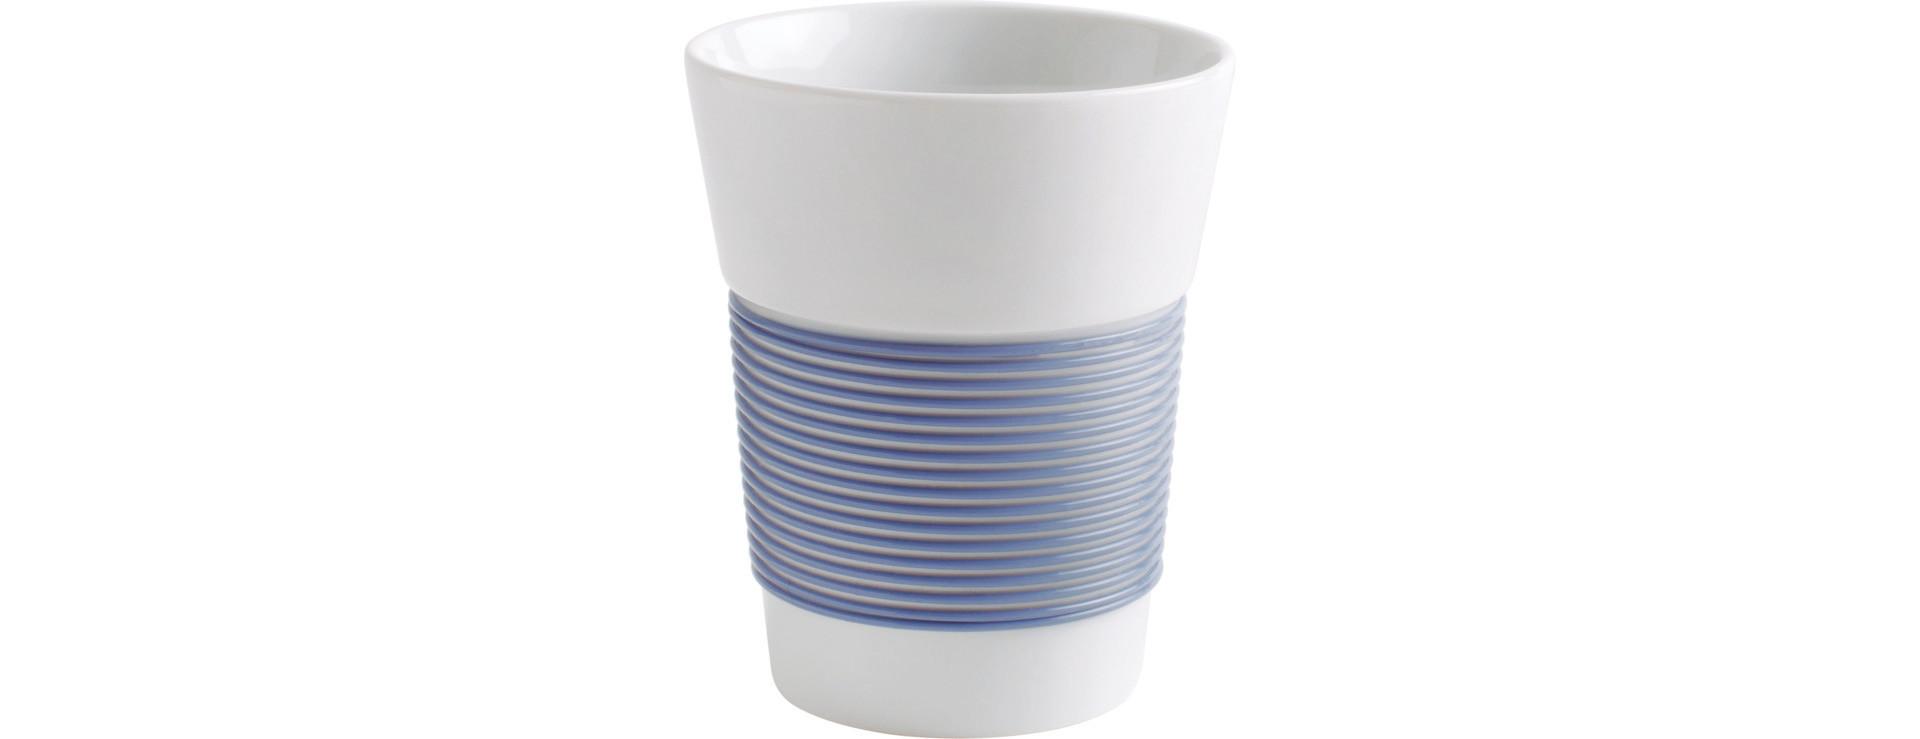 cupit, Becher ø 95 mm / 0,35 l stormy blue mit Magic Grip + Boden